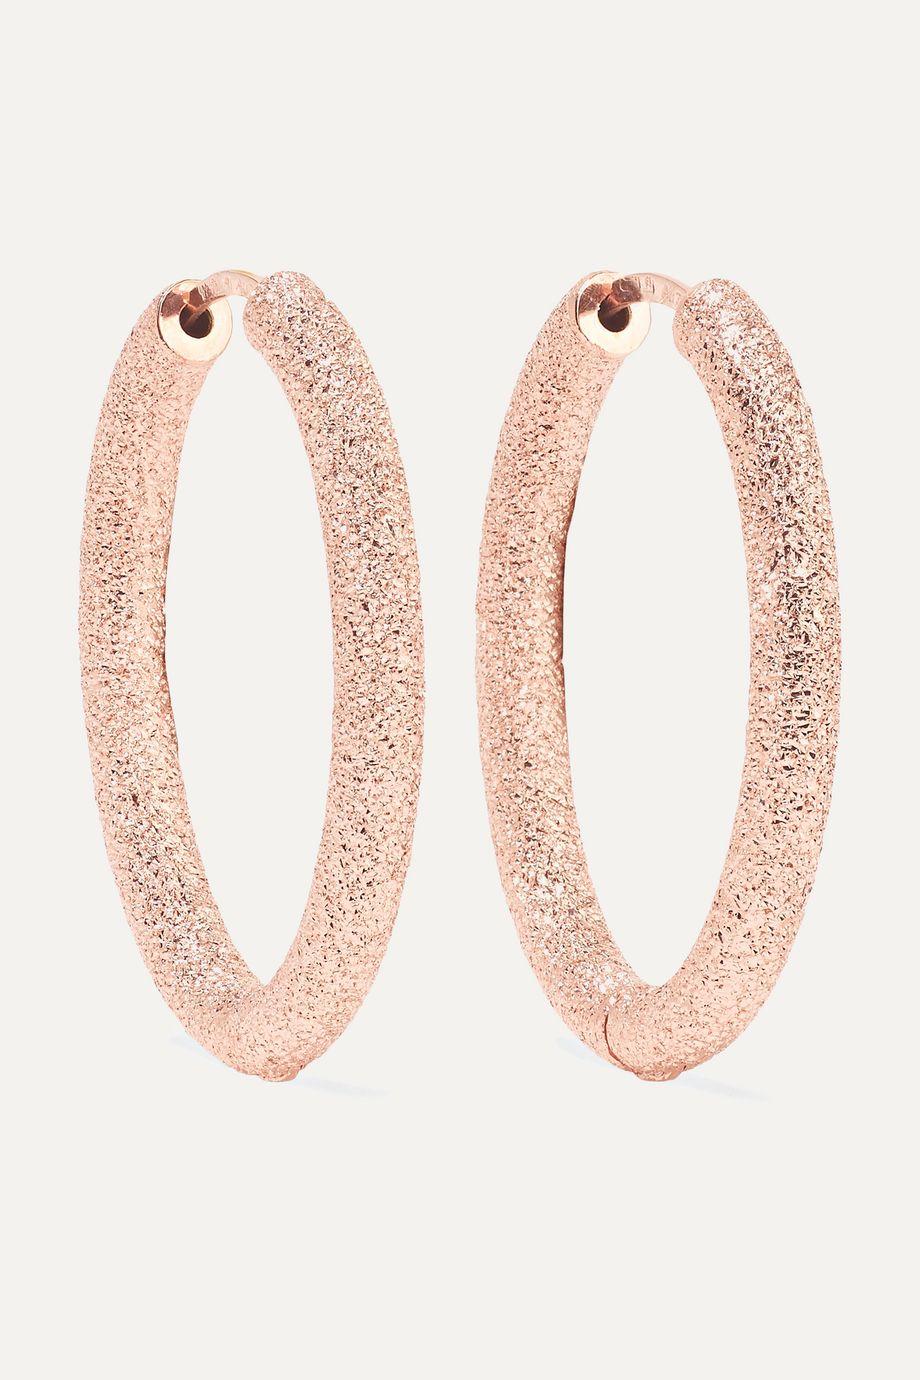 Carolina Bucci Florentine 18-karat rose gold hoop earrings